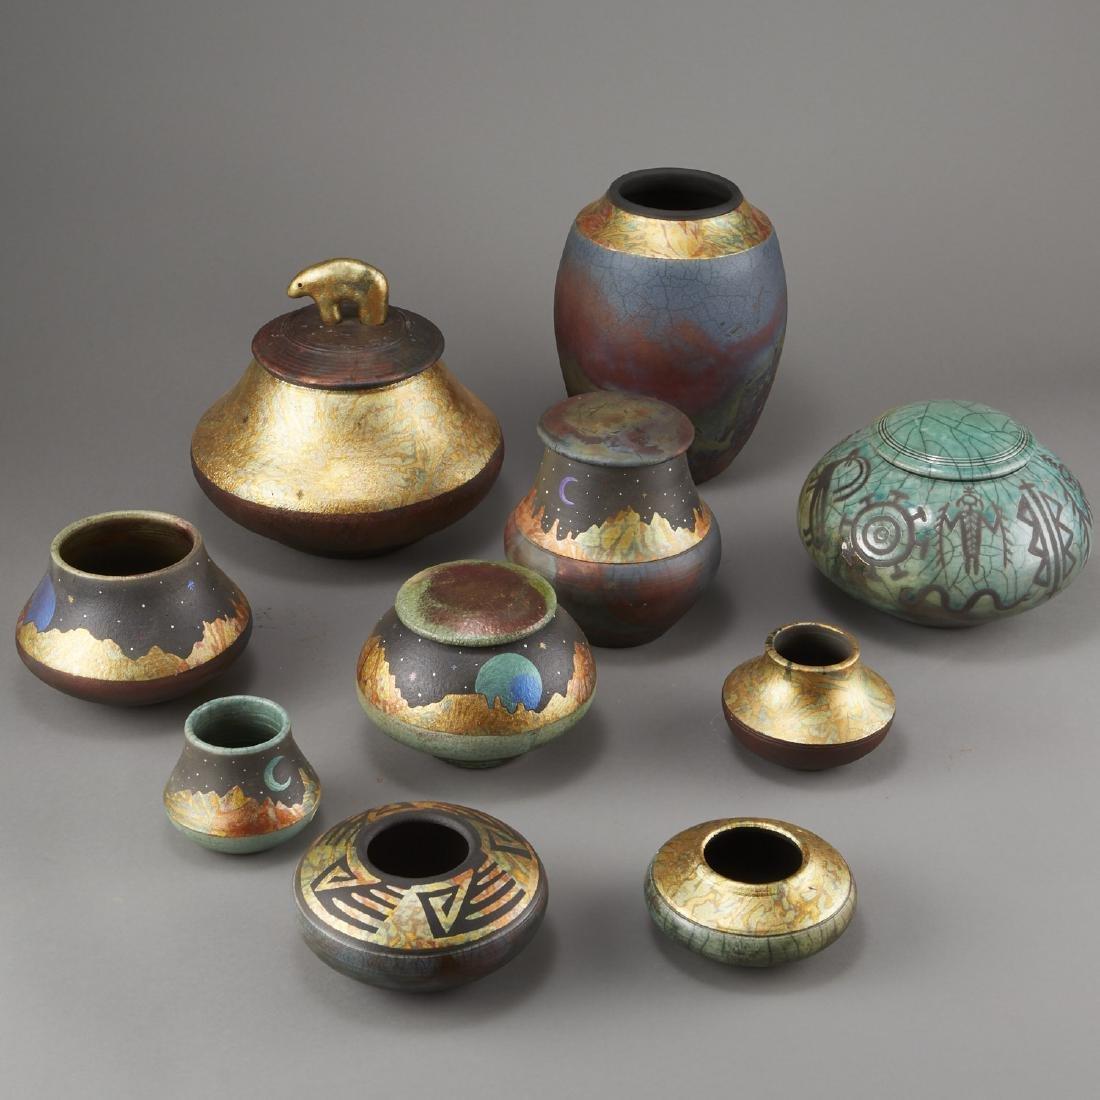 Group of 10 Rick Loewenkamp Raku Pottery